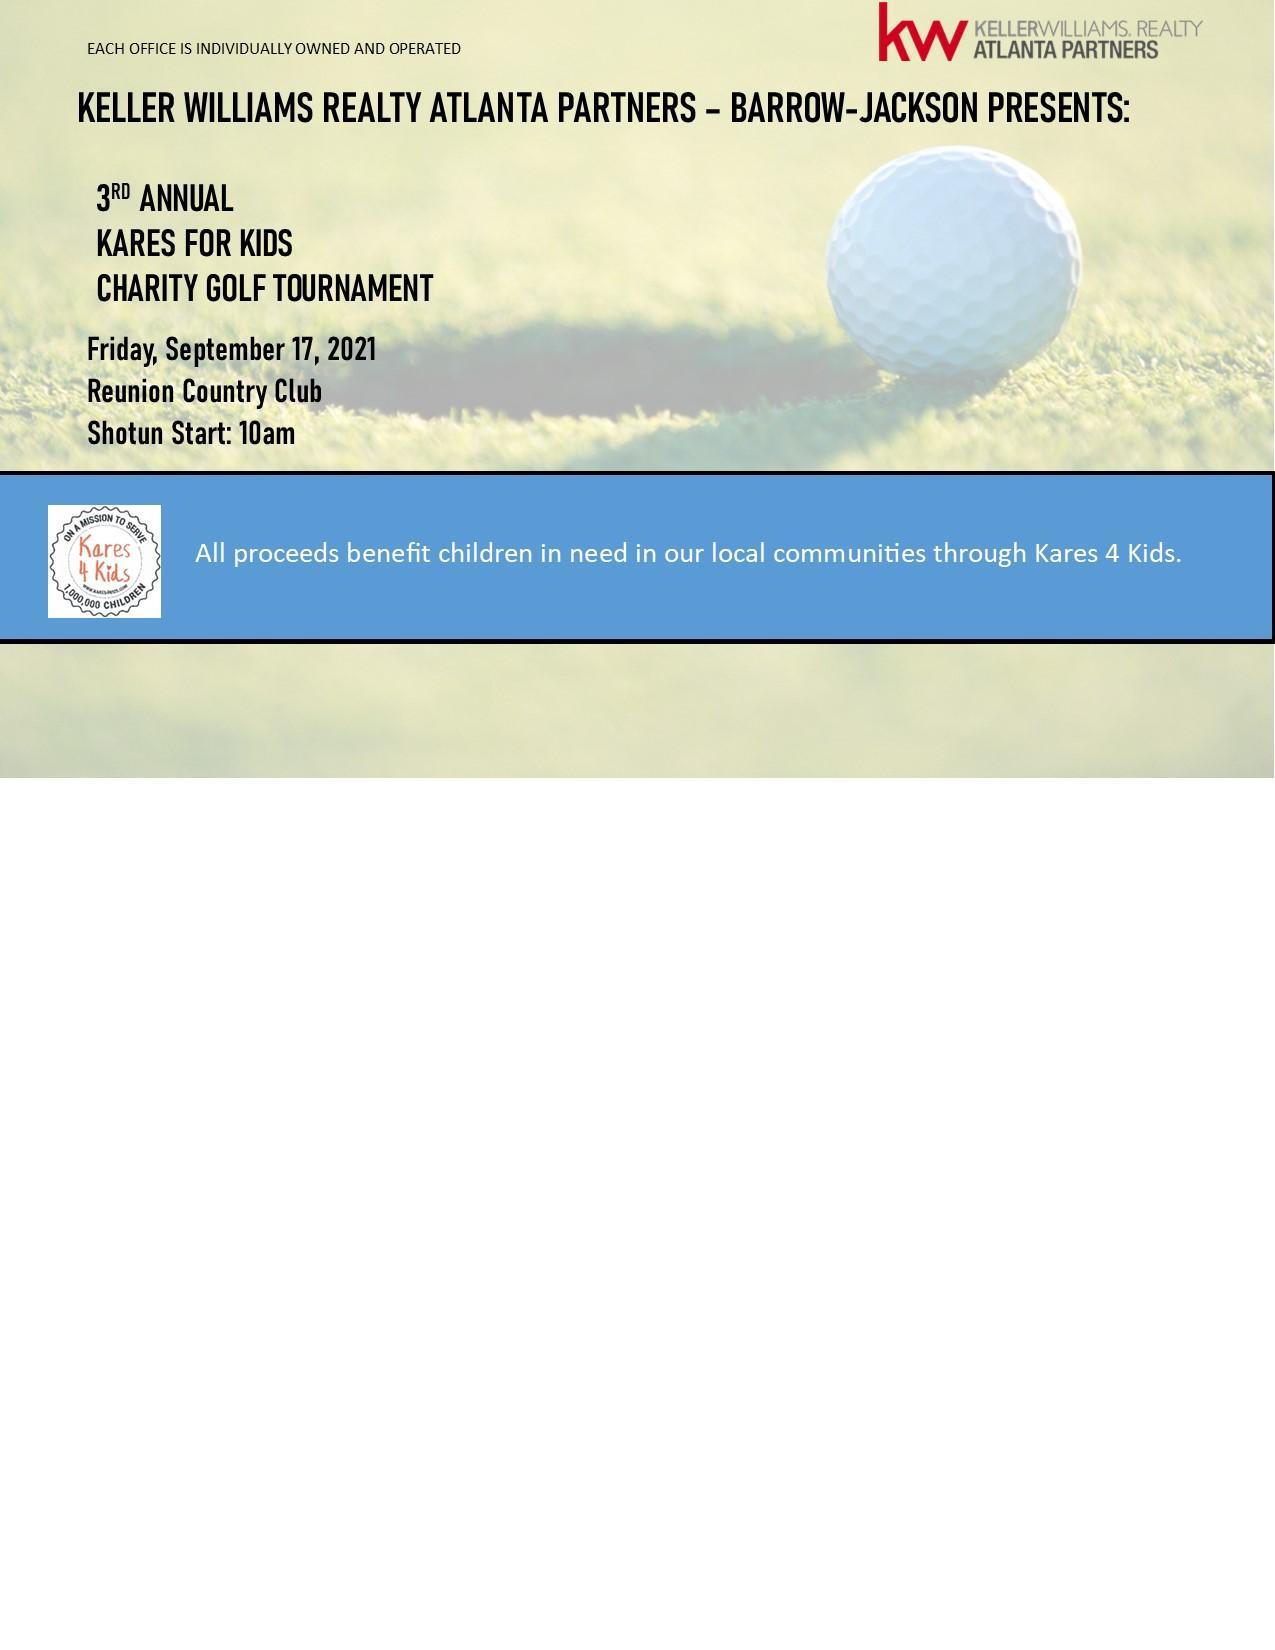 3rd Annual Kares 4 Kids Golf Tournament